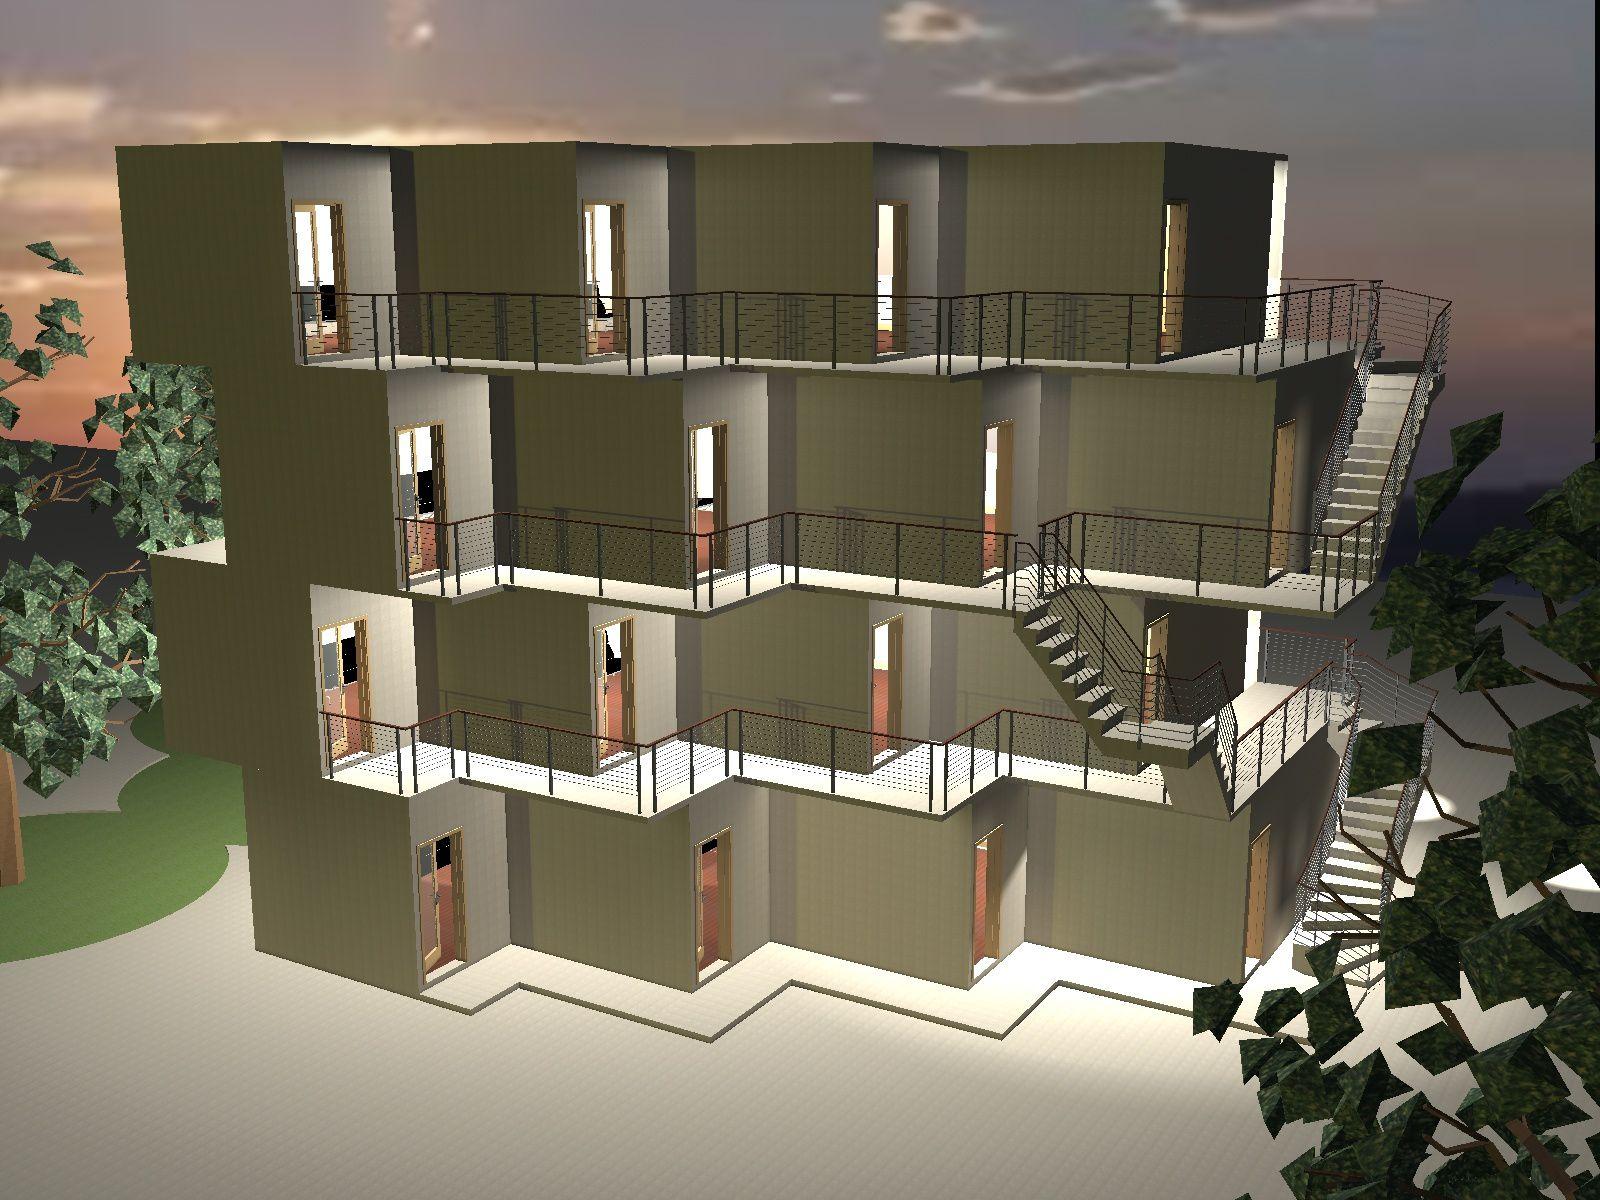 etude projet de 16 logement etudiants courbevoie 92400. Black Bedroom Furniture Sets. Home Design Ideas